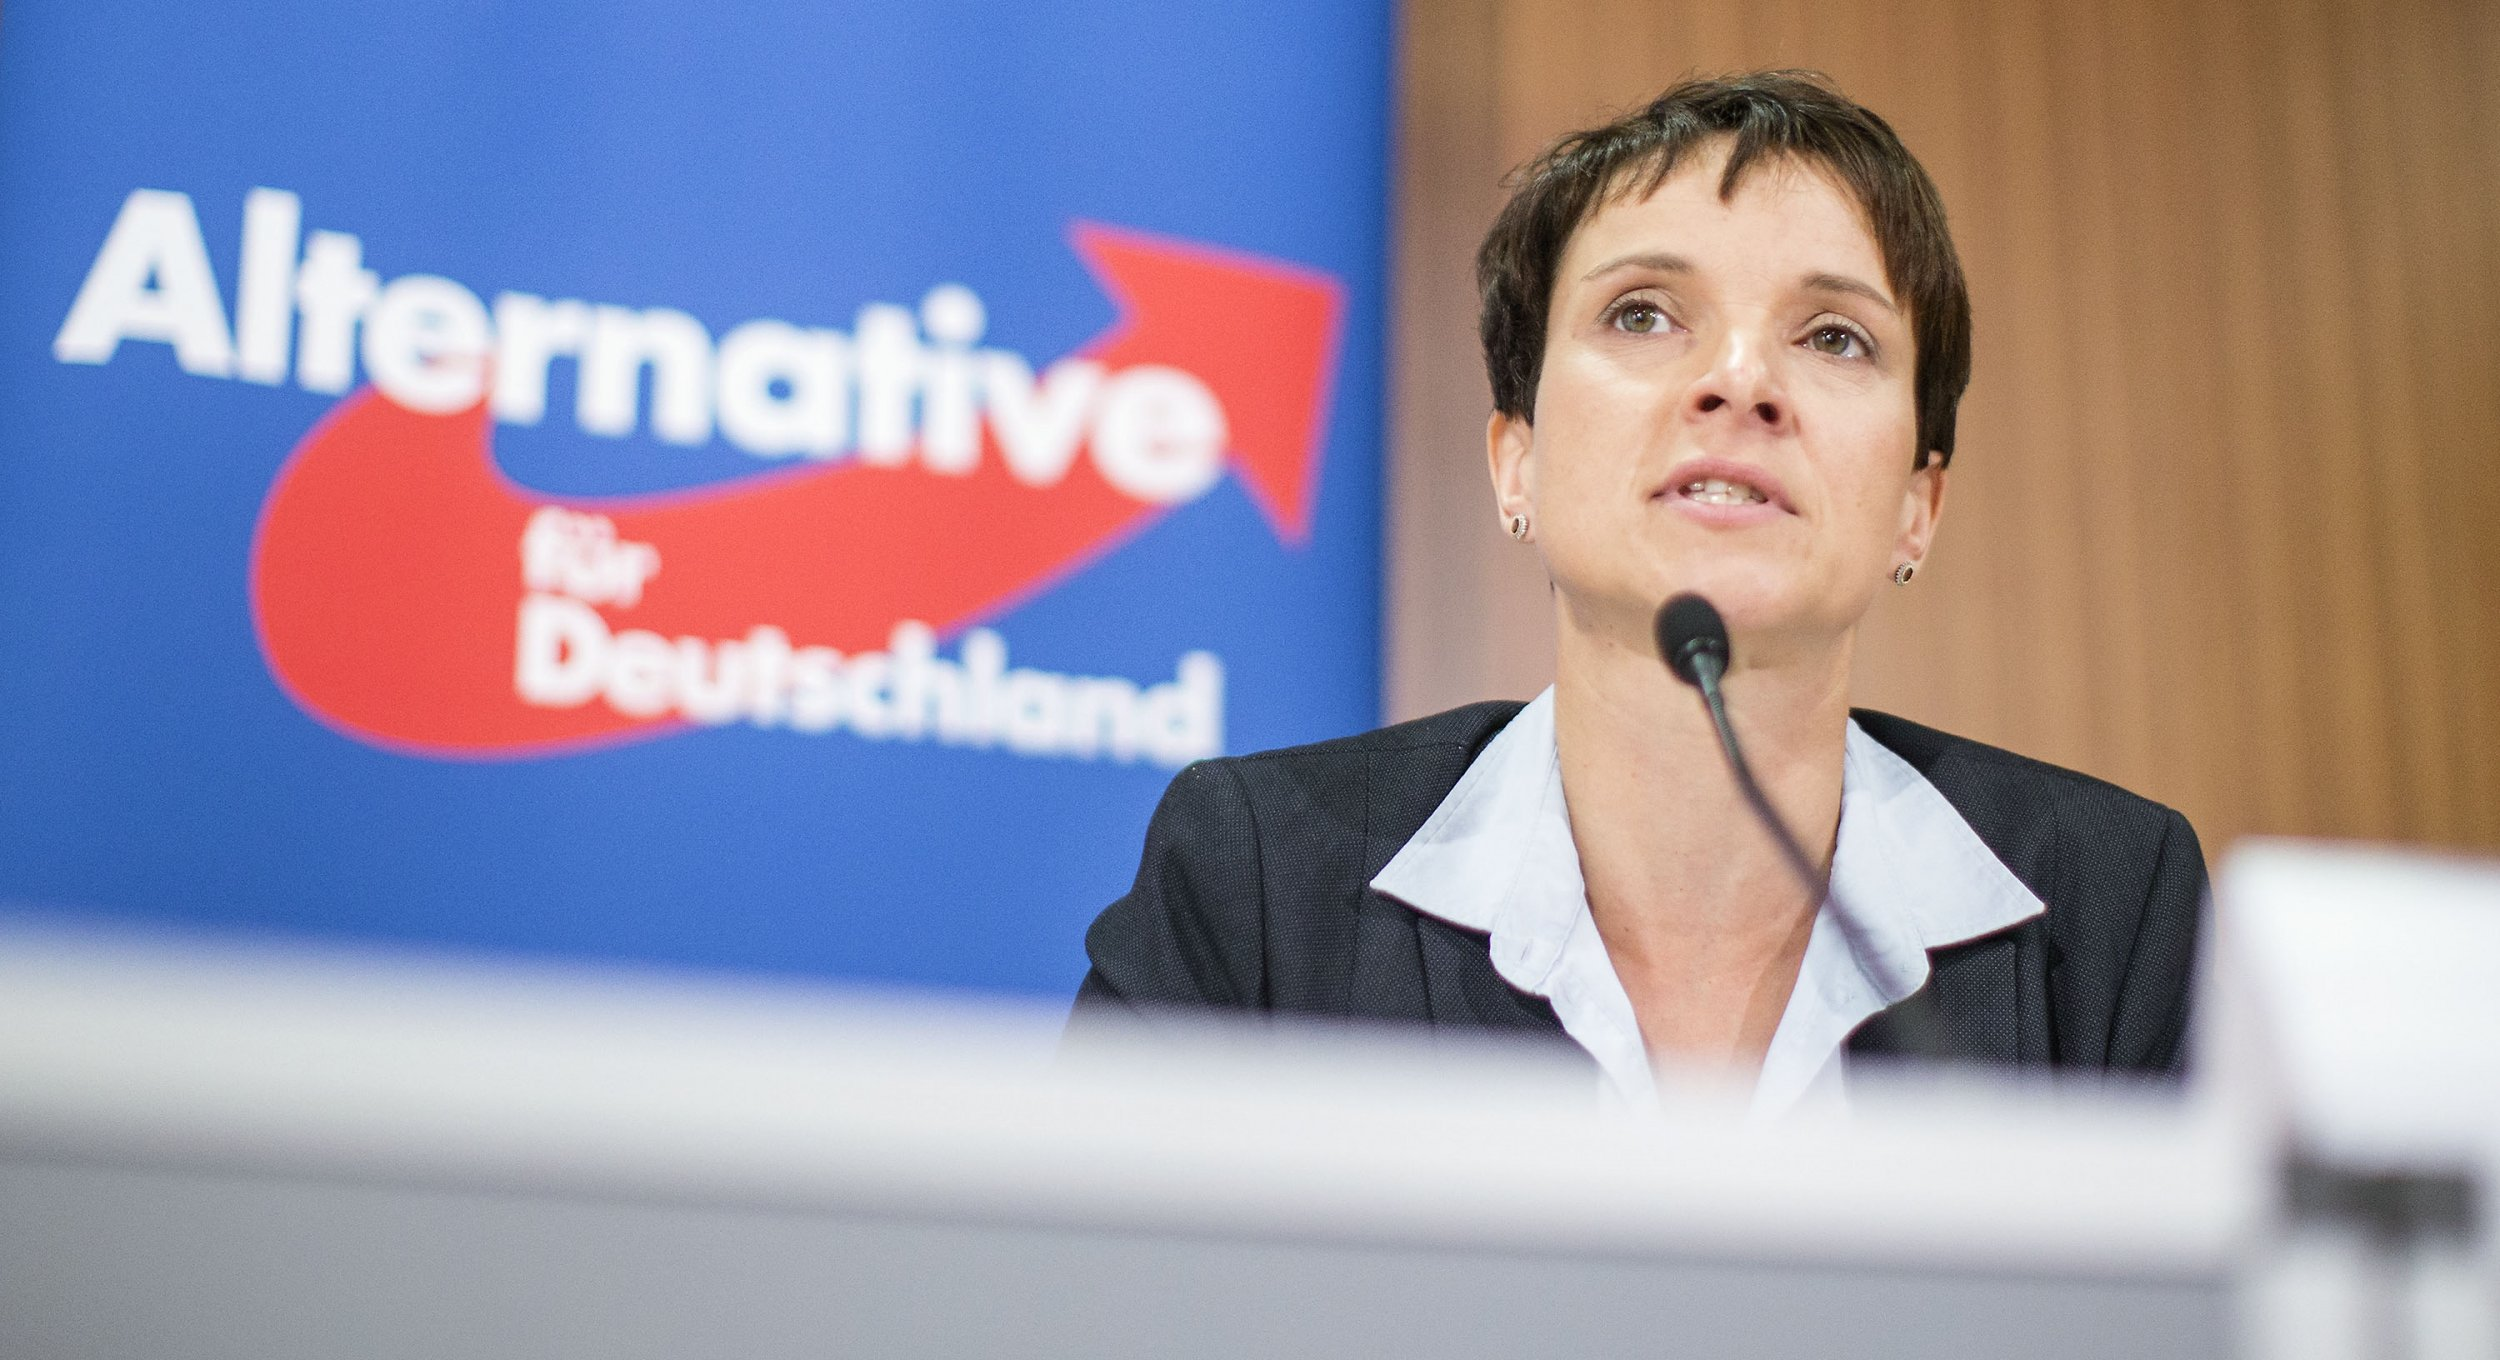 Frauke Petry leader of Alternative for Germany (AfD).